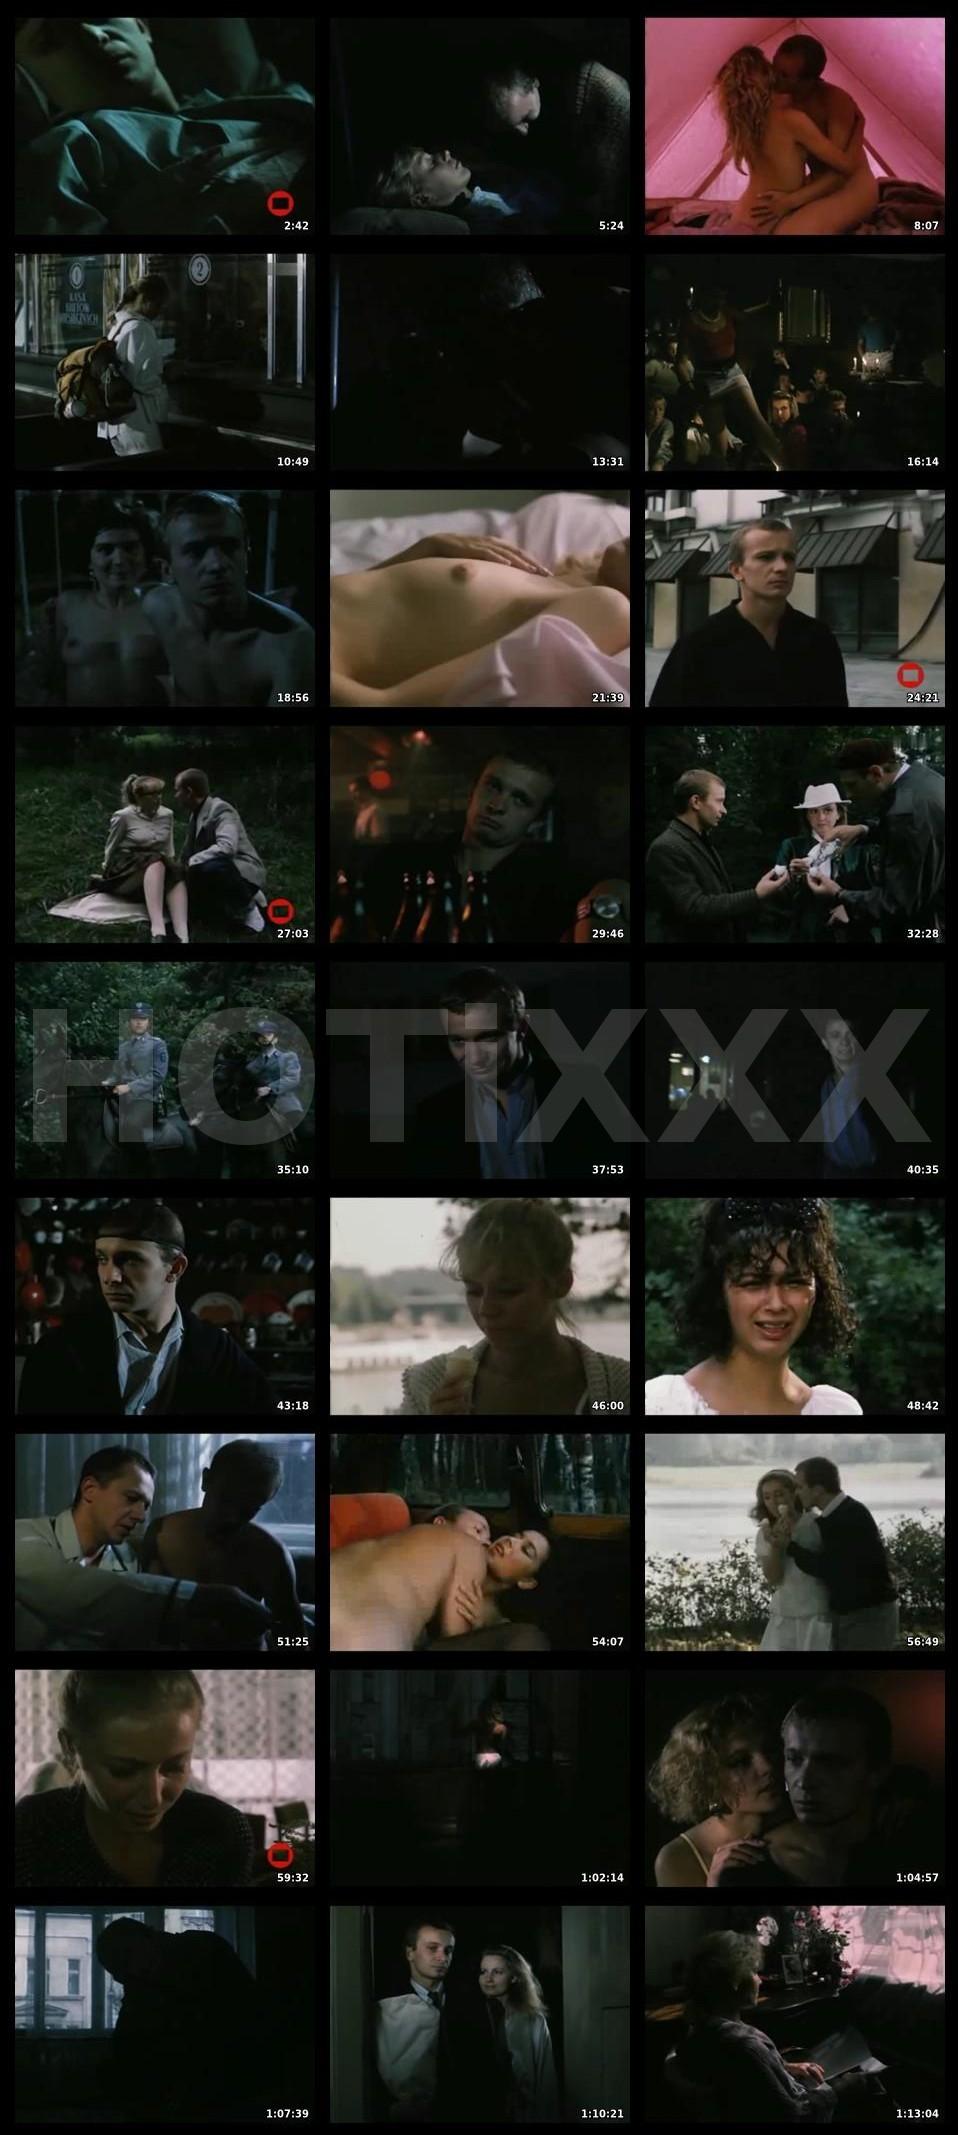 eroticheskie-filmi-polsha